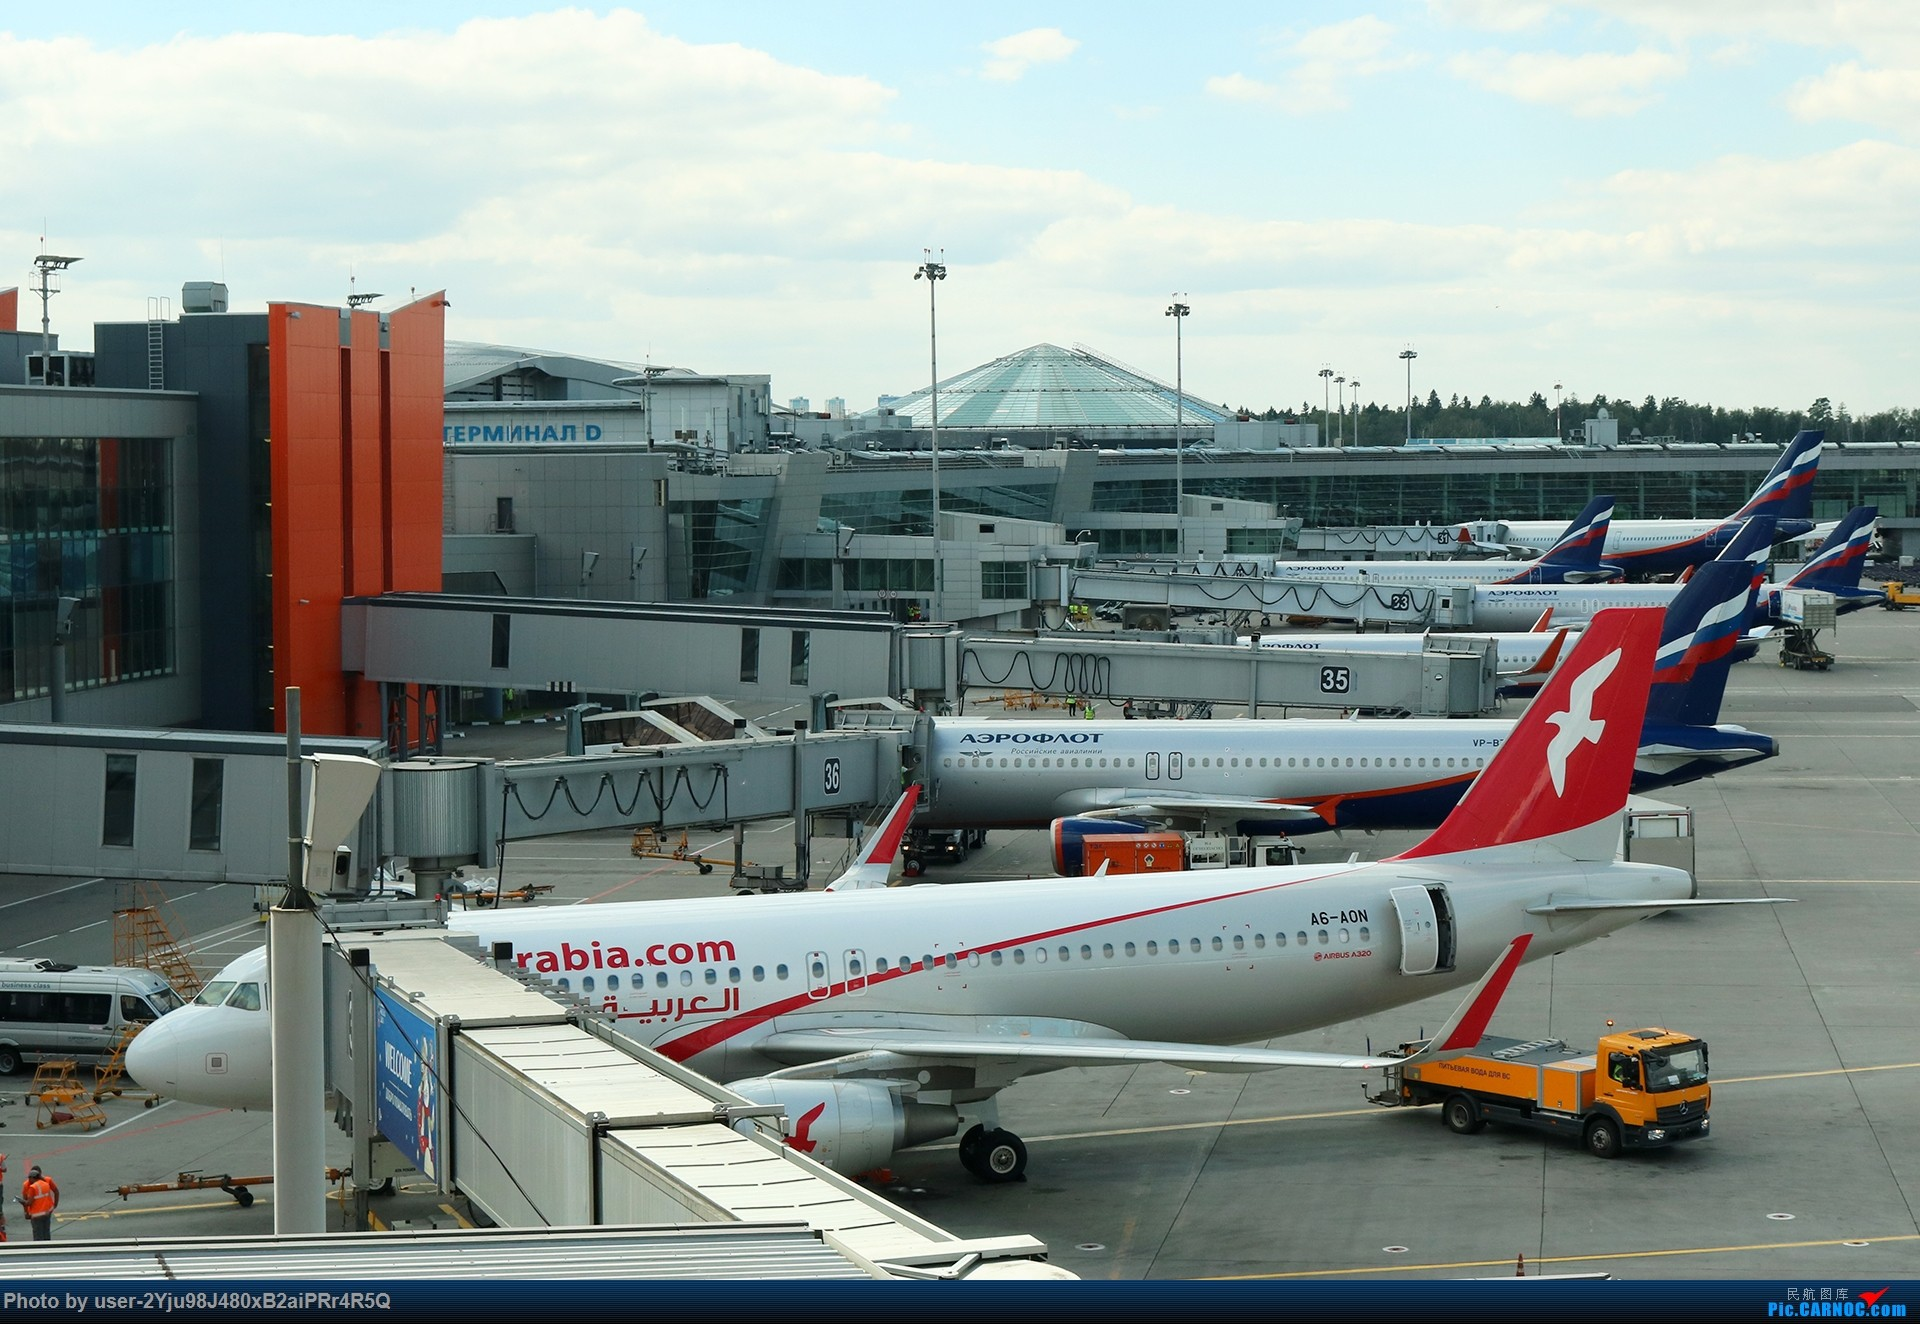 Re:[原创]LIULIU Sheremetyevo的漫游 Aeroflot毛航篇 AIRBUS A320-214(SL)  俄罗斯谢诺梅杰沃机场